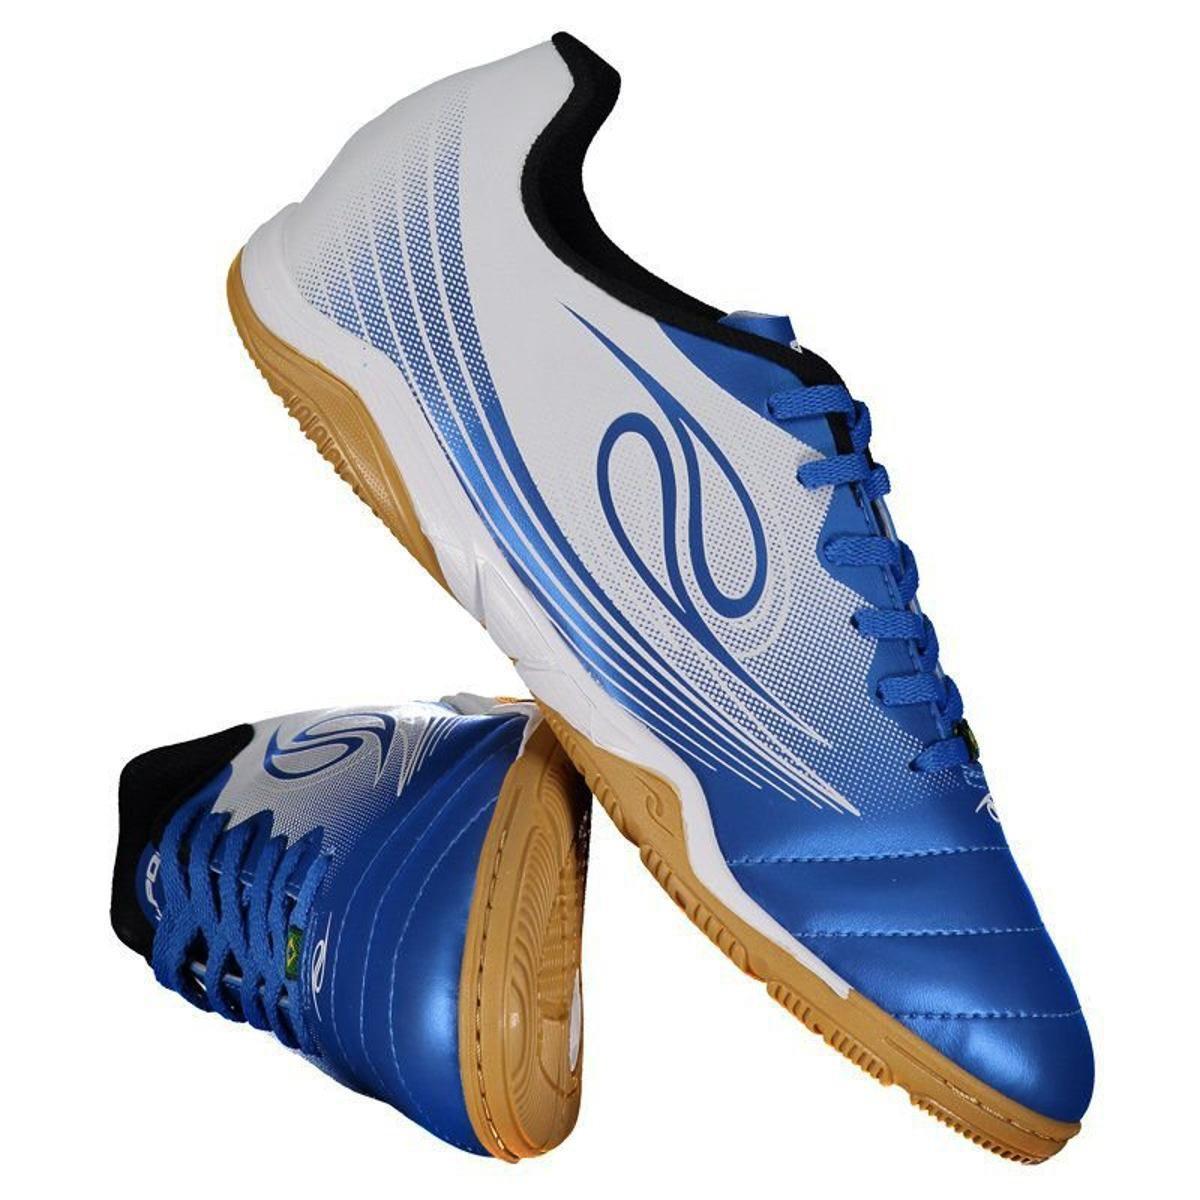 aeb5d6516d1 Chuteira Futsal Dalponte Squad Masculina - Azul - Compre Agora ...